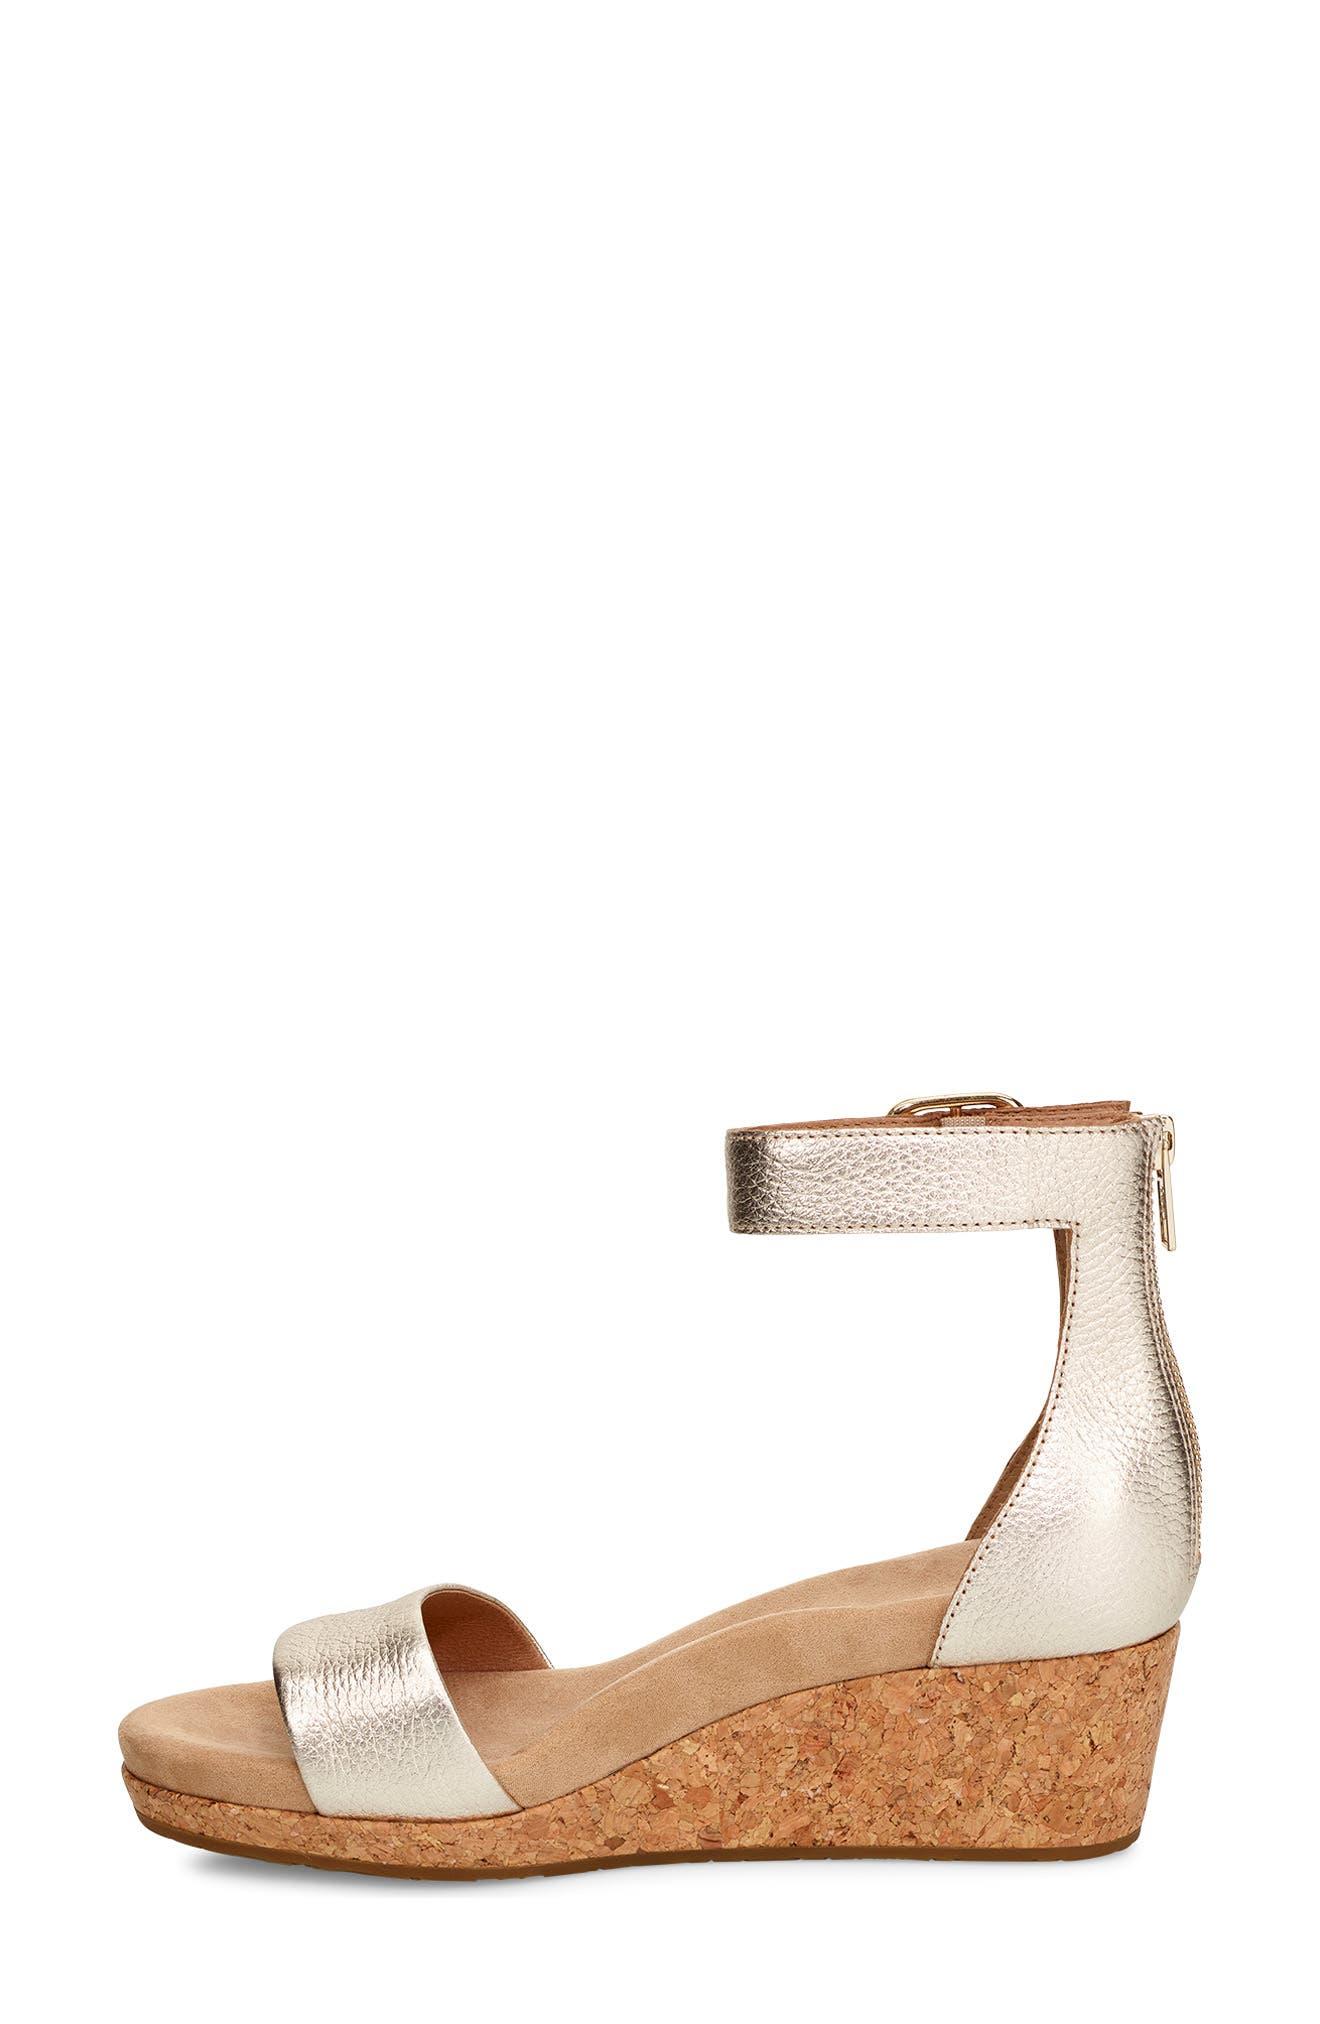 UGG<SUP>®</SUP>, Zoe II Metallic Wedge Sandal, Alternate thumbnail 6, color, GOLD LEATHER